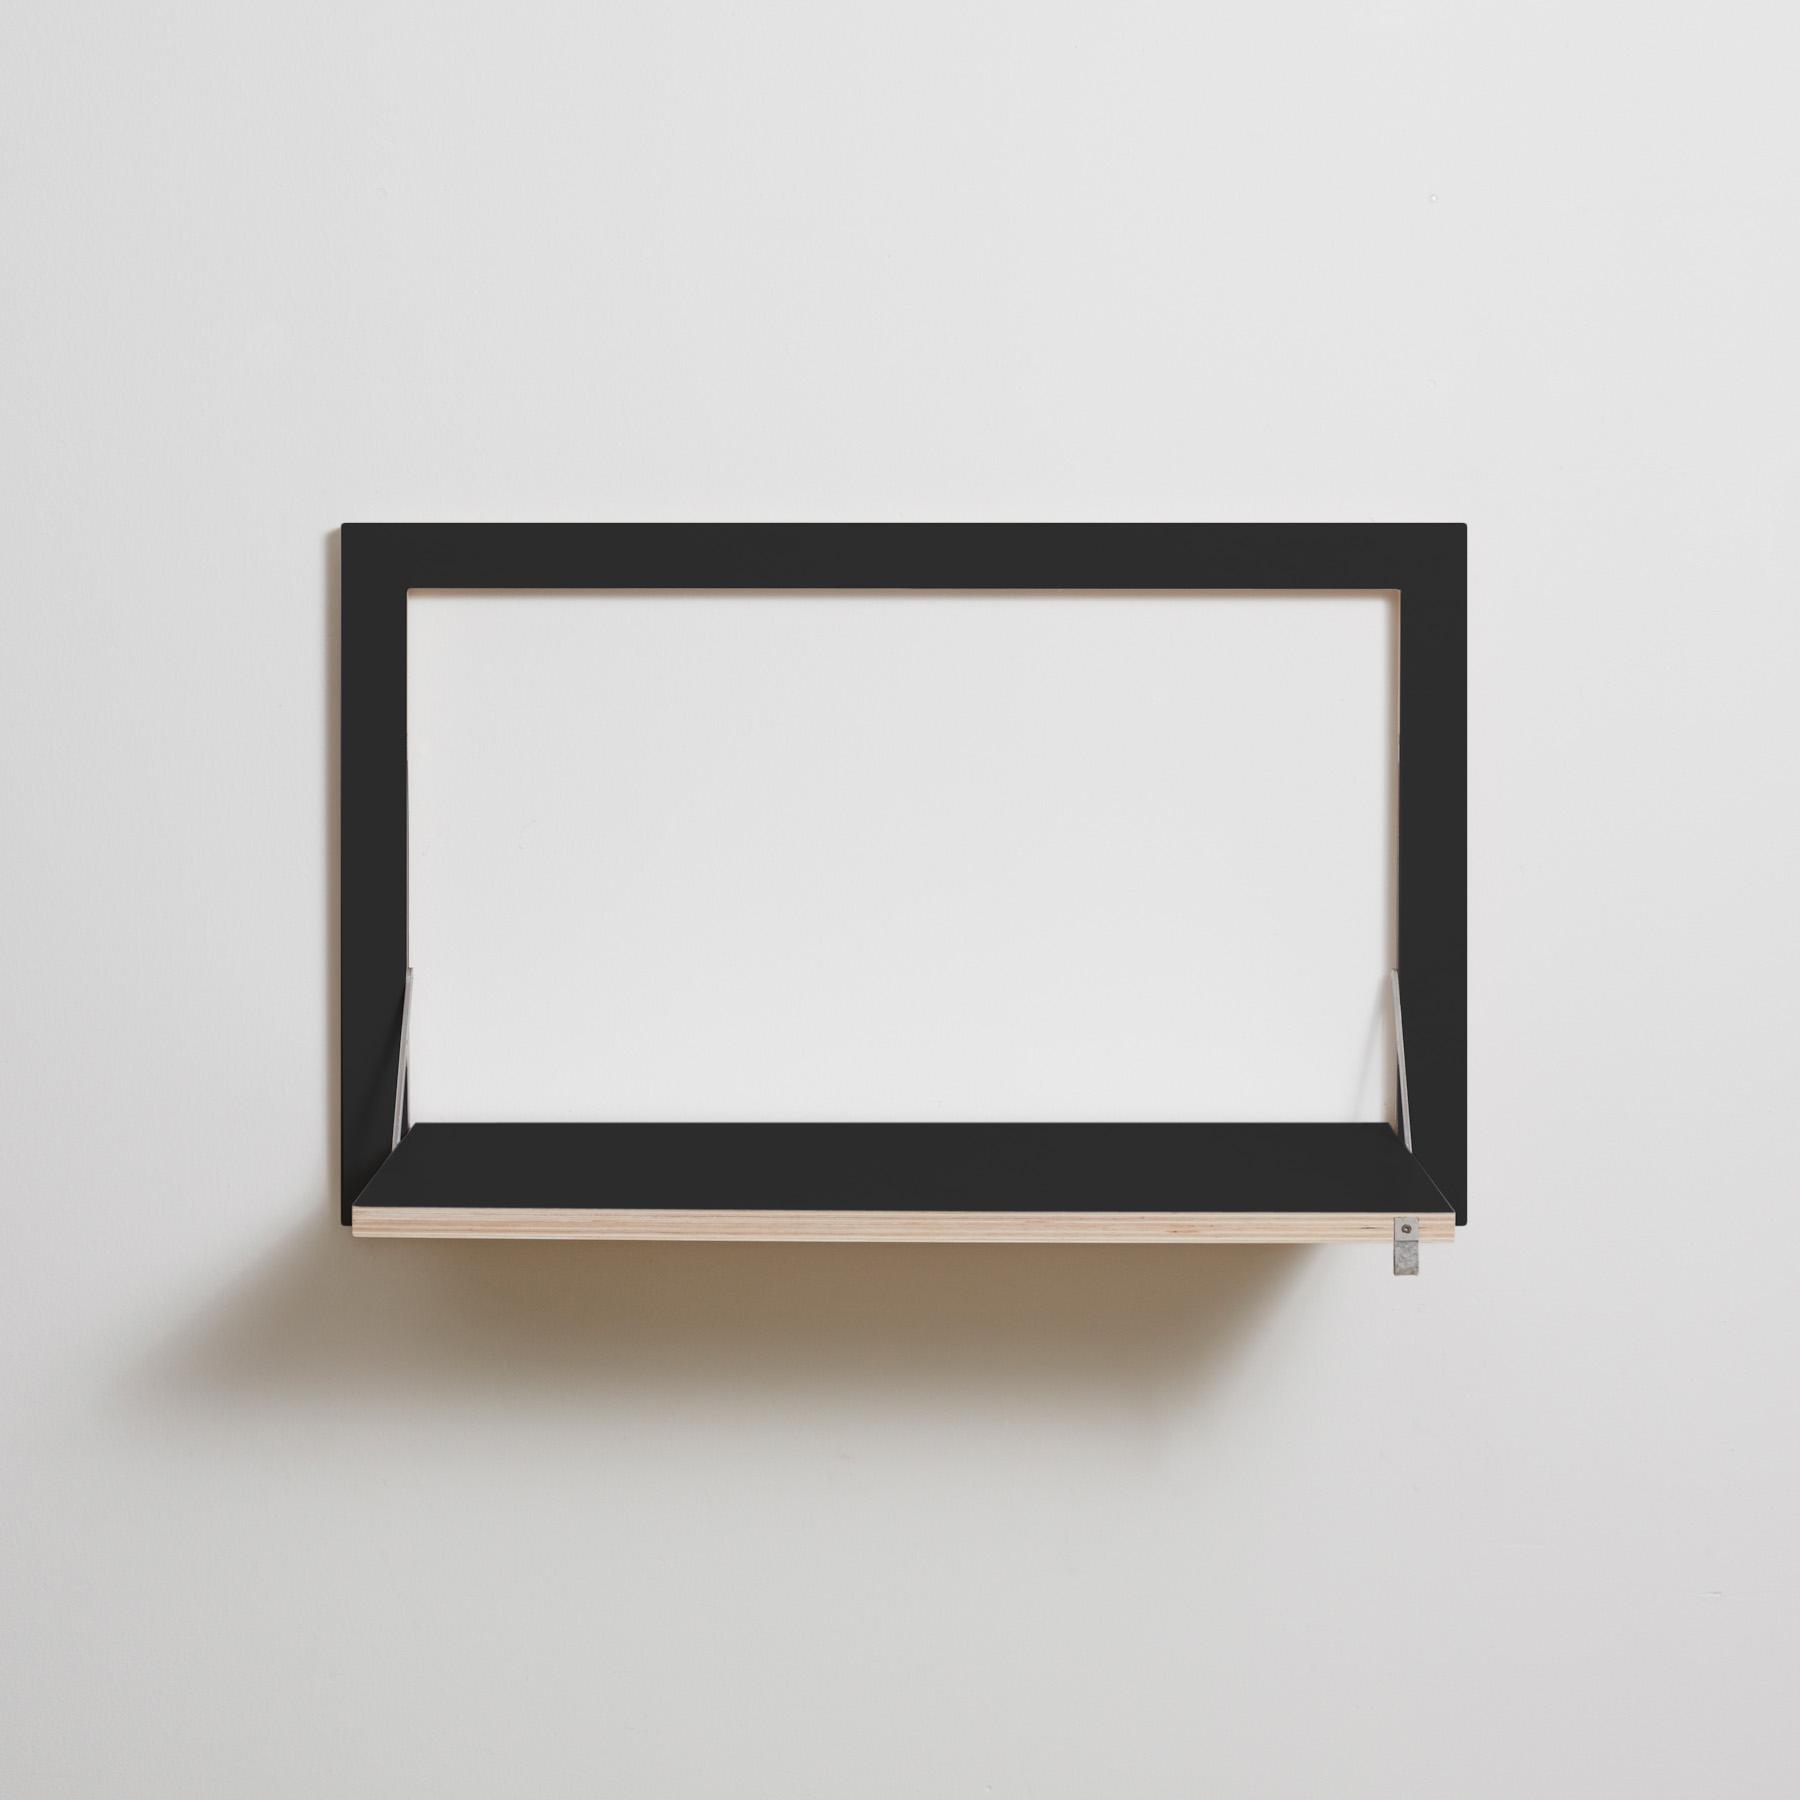 Vaegskrivebord-1